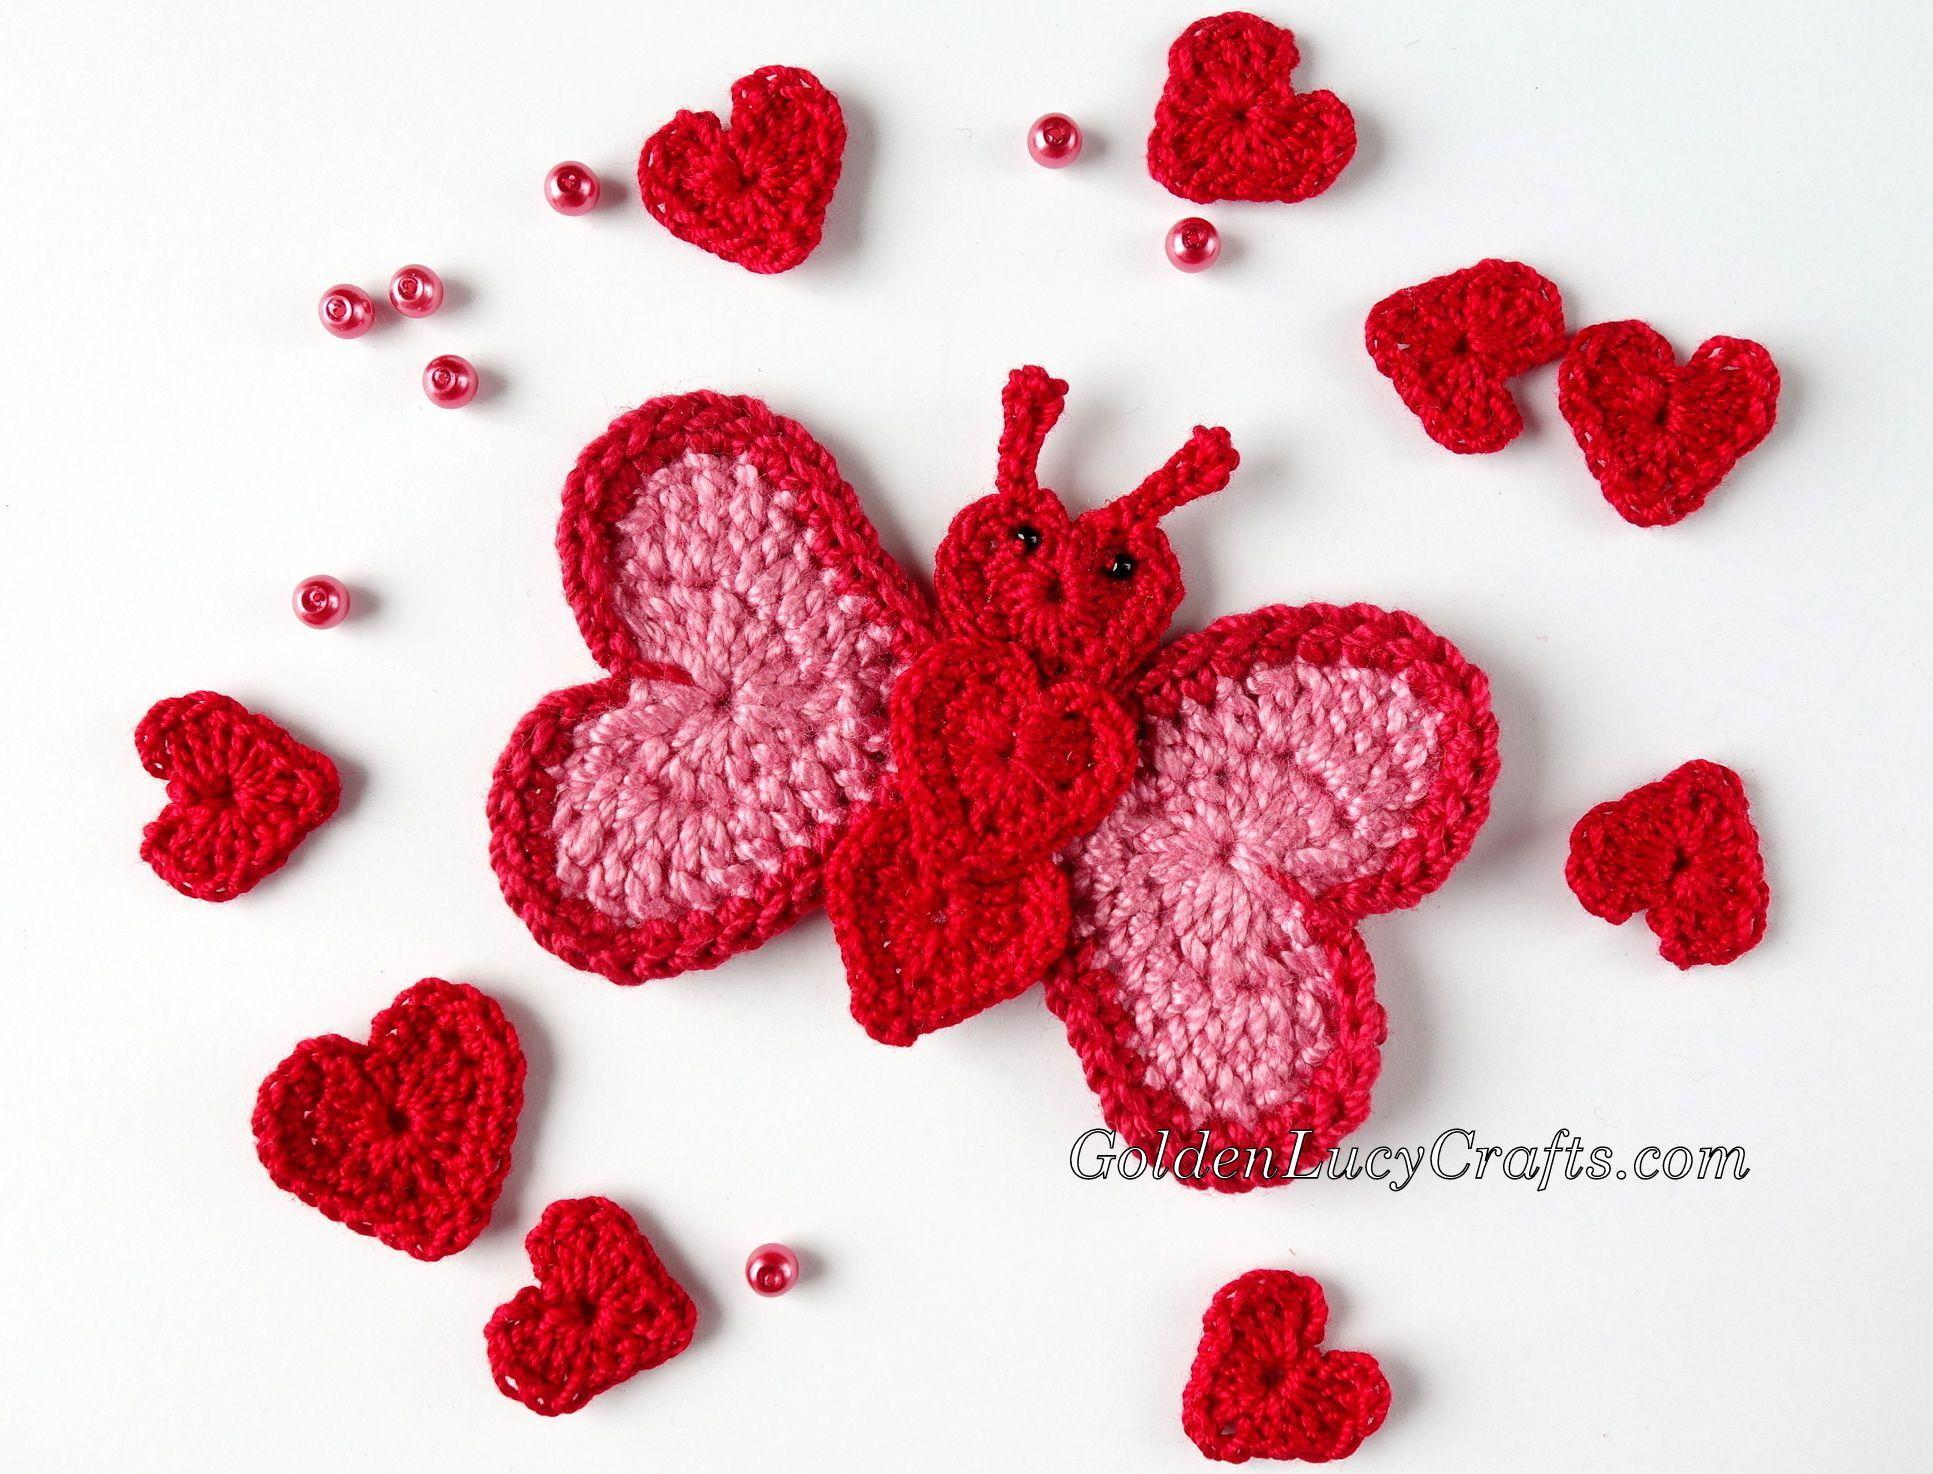 Envelope heart includes both applique and stitched u blasto stitch